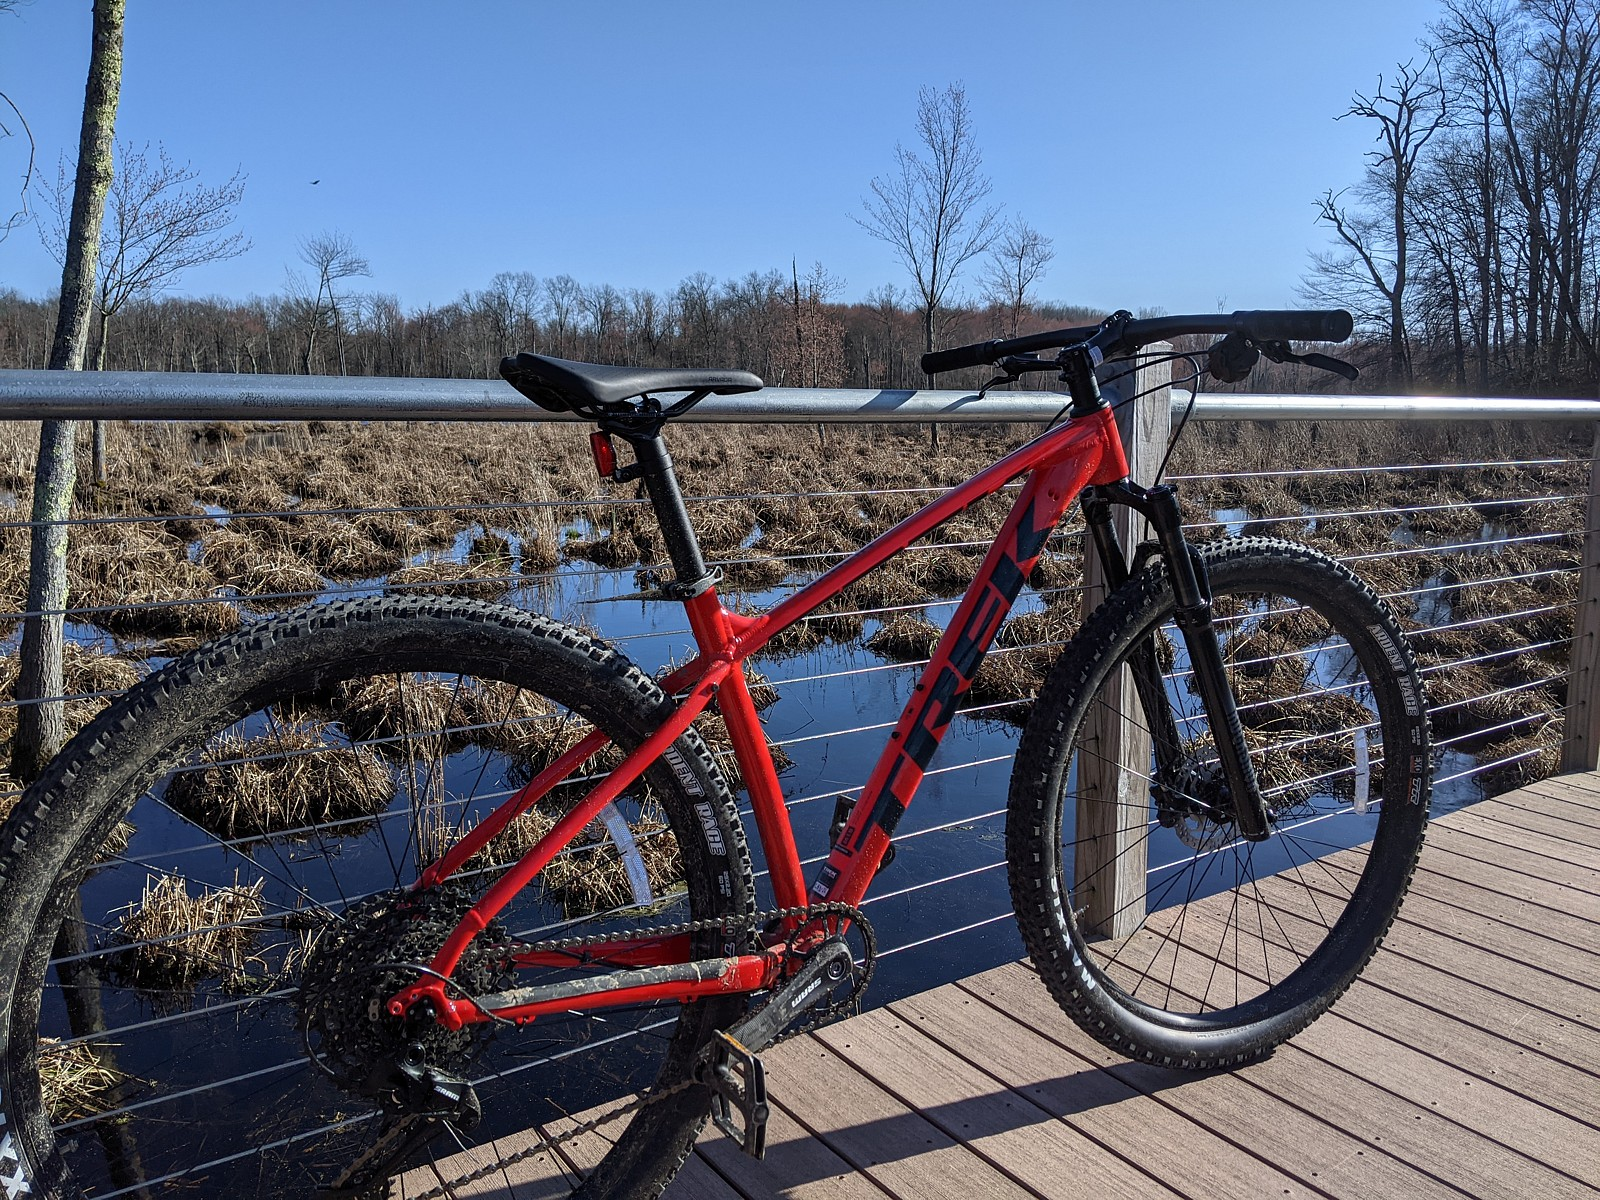 PXL 20210329 204656968 - Where's Waldy - Mountain Biking Pictures - Vital MTB